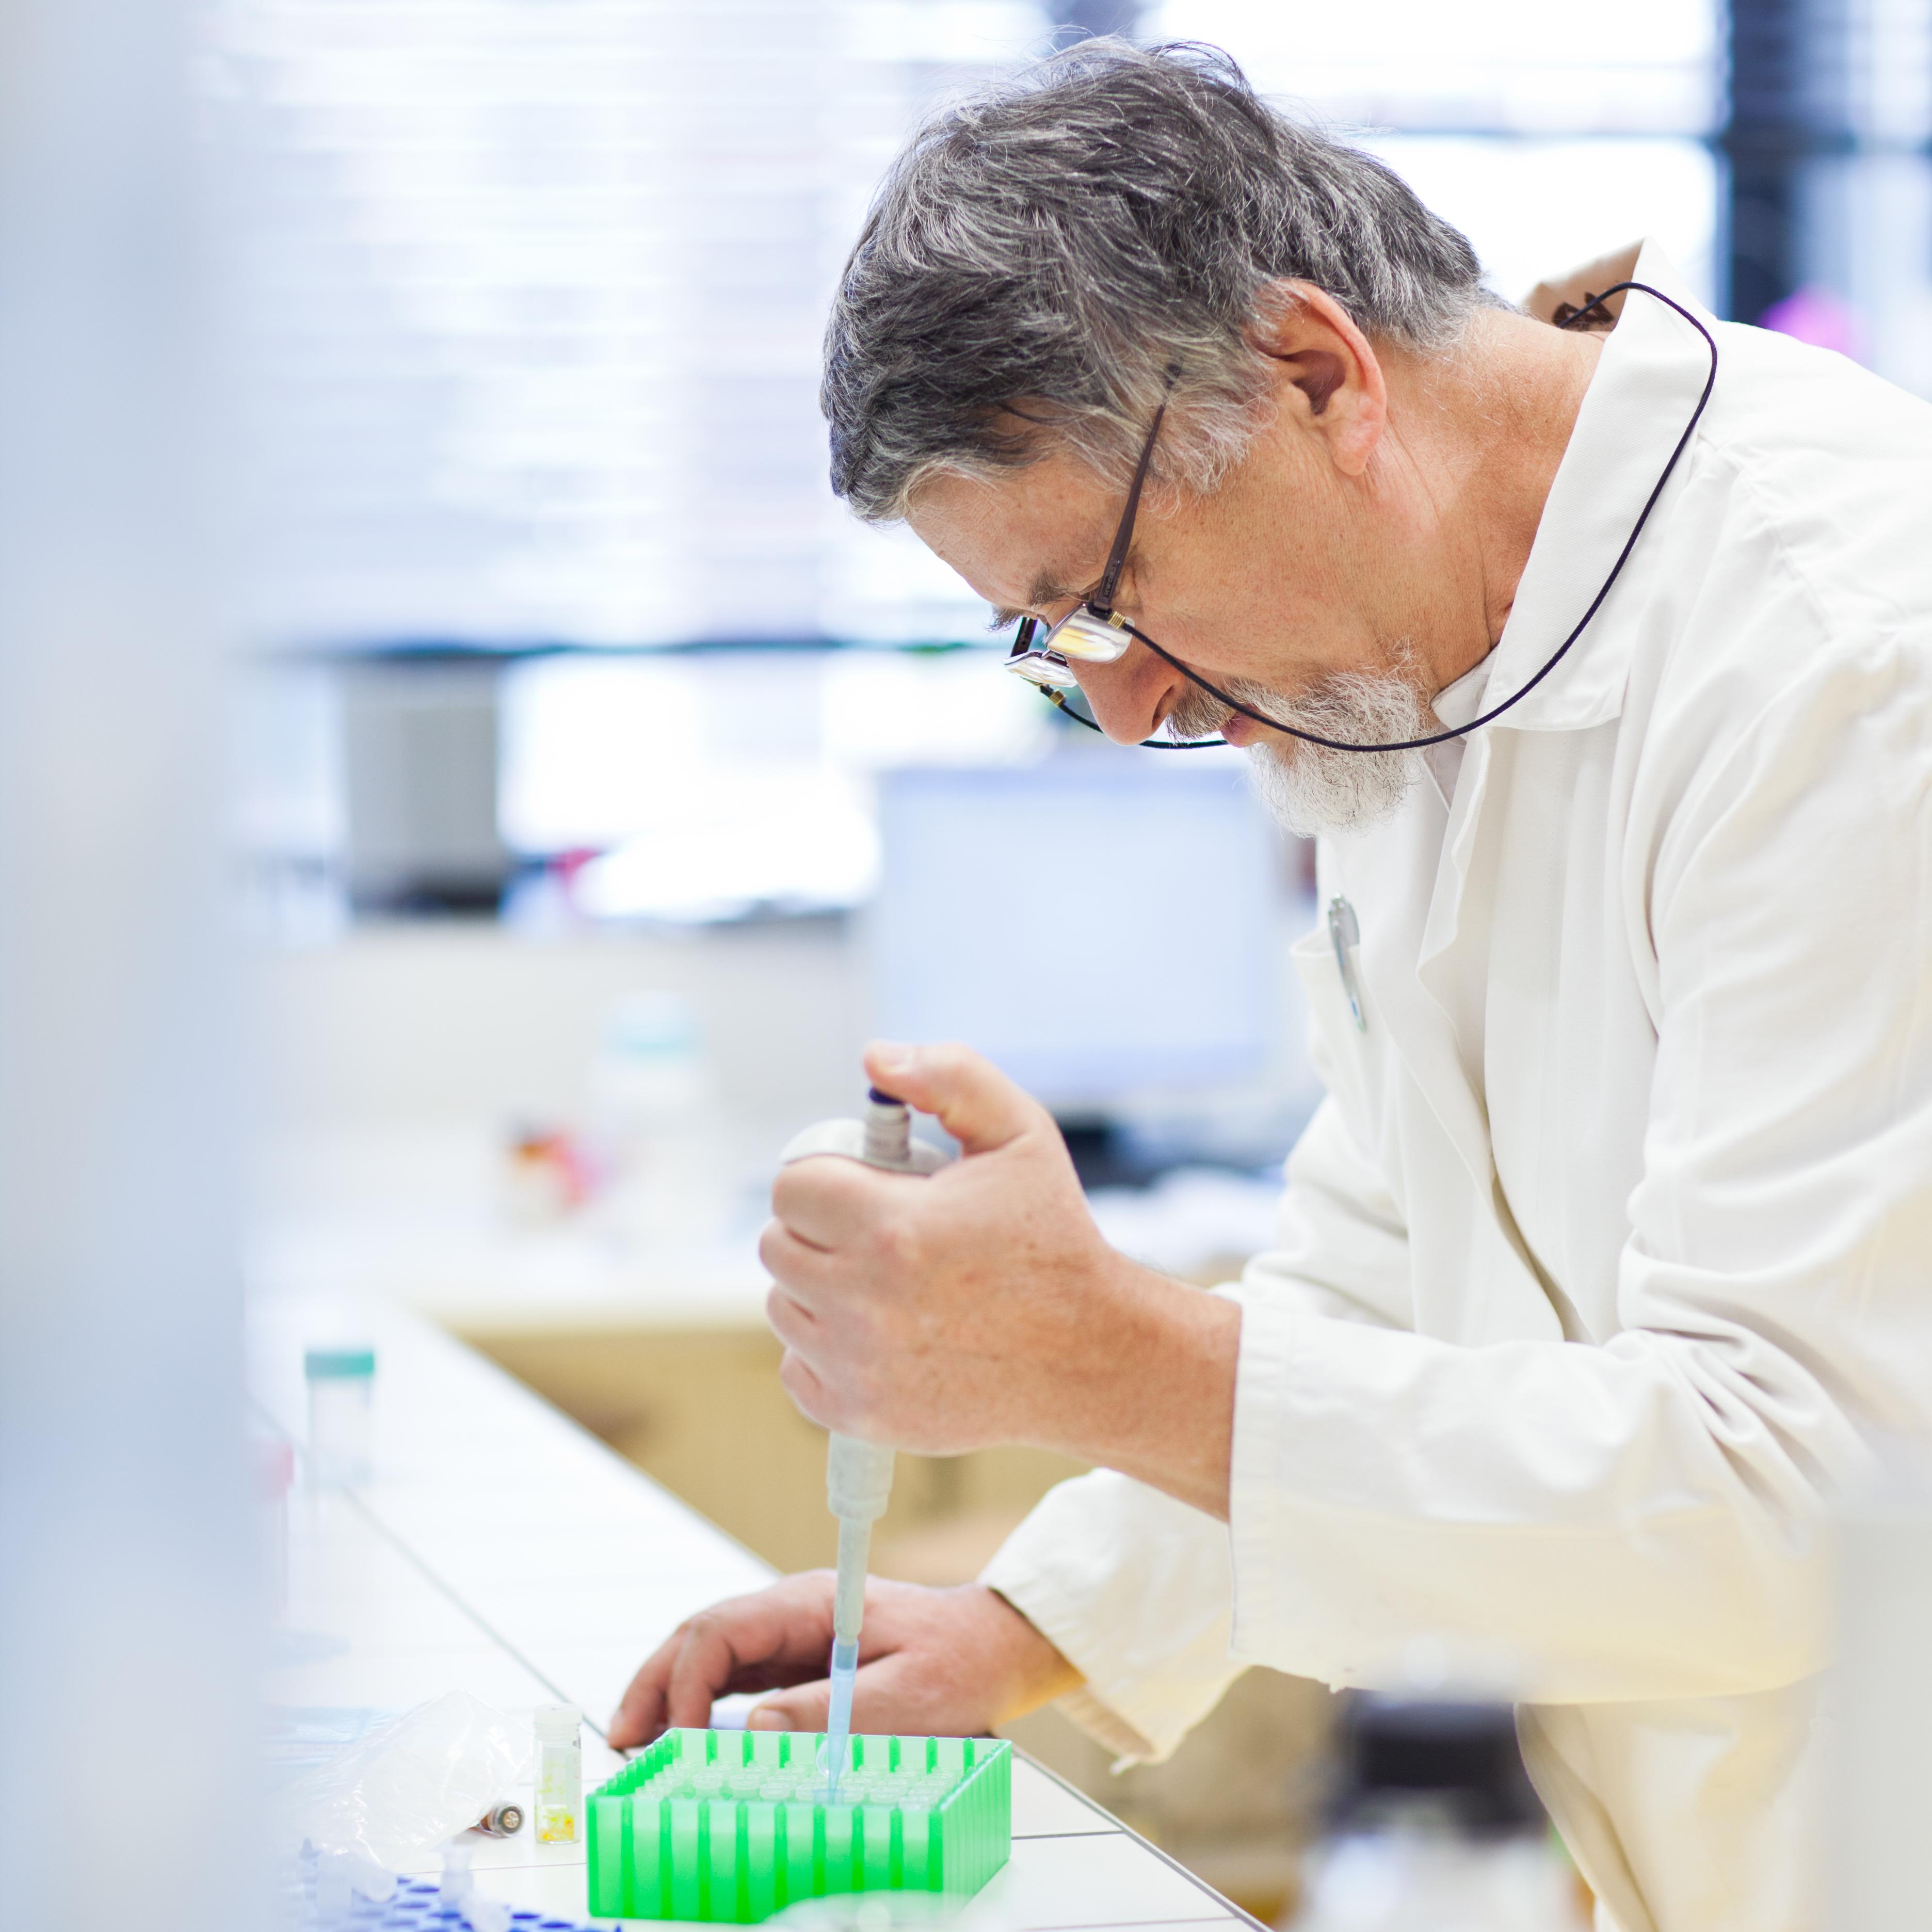 senior-male-researcher-carrying-out-scientific-PKWJC4N